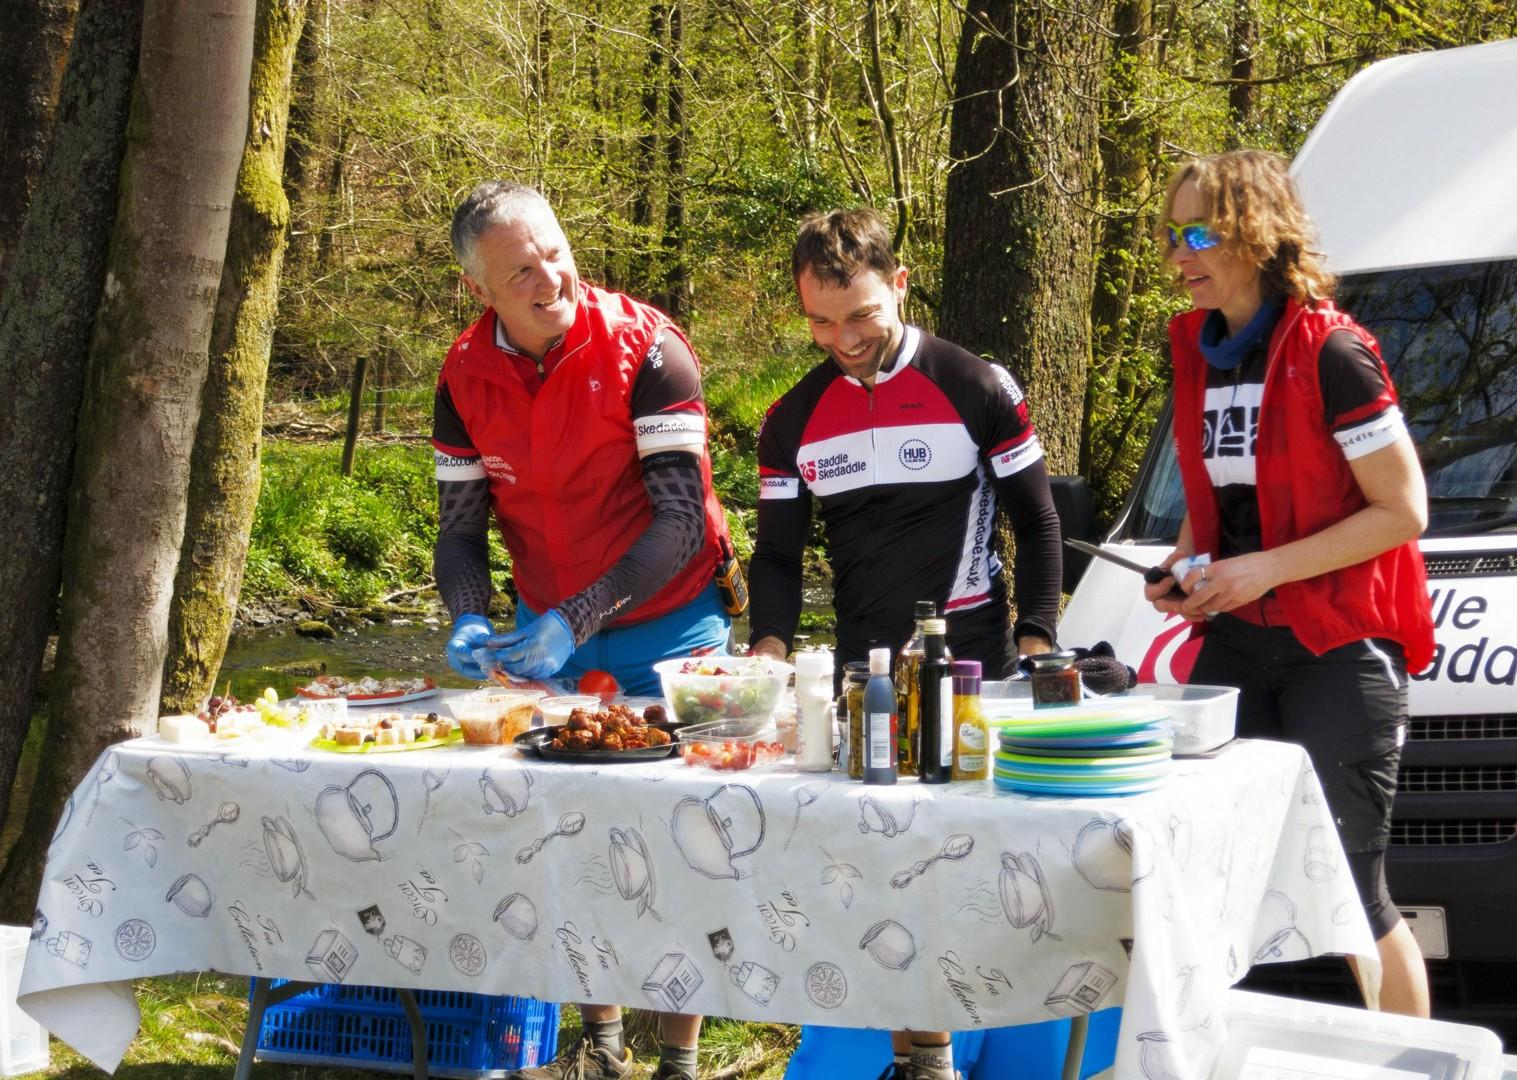 guided-mountain-bike-holida-in-UK-Lake-District-biking-classic-coniston.jpg - UK - Lake District - Classic Coniston - Guided Mountain Bike Weekend - Mountain Biking